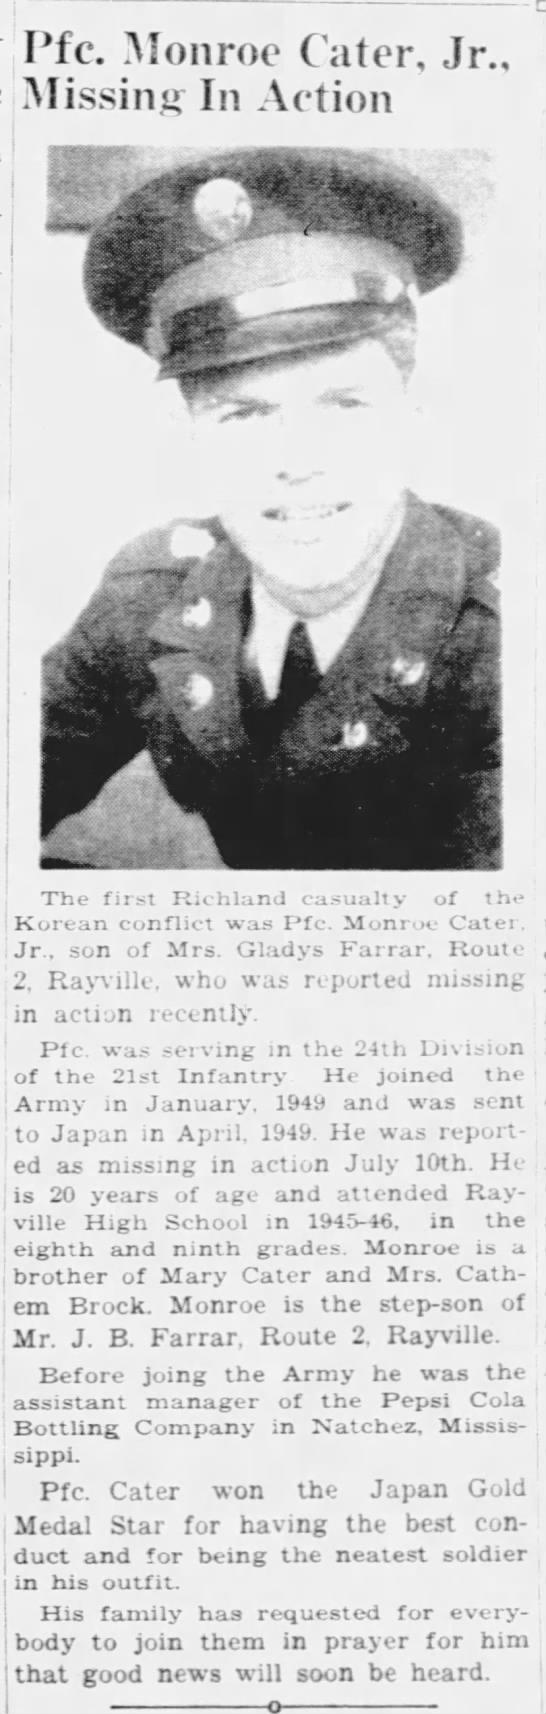 Pfc. Monroe Cater, Jr. -